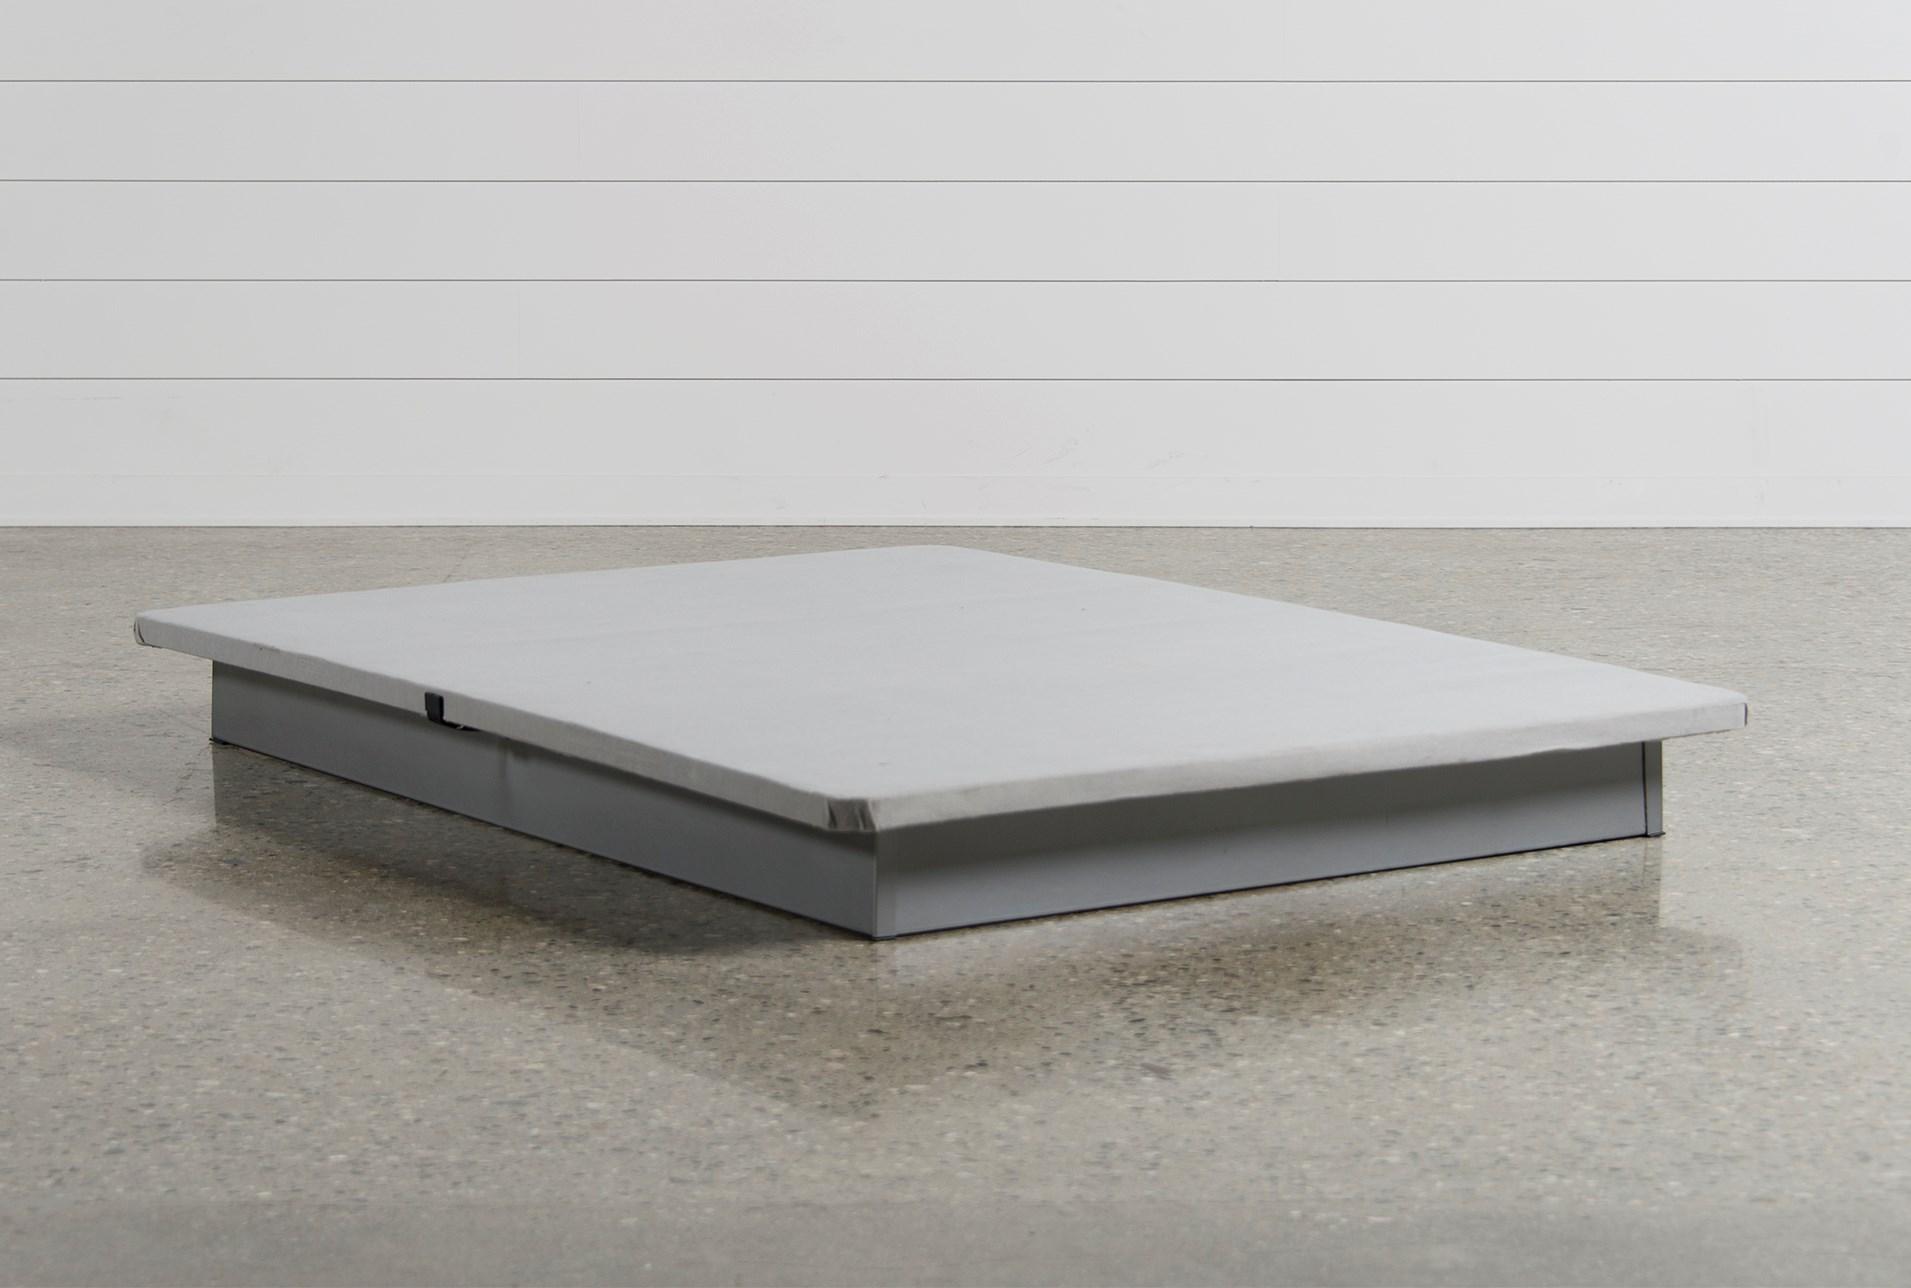 sage queen bunky board living spaces. Black Bedroom Furniture Sets. Home Design Ideas